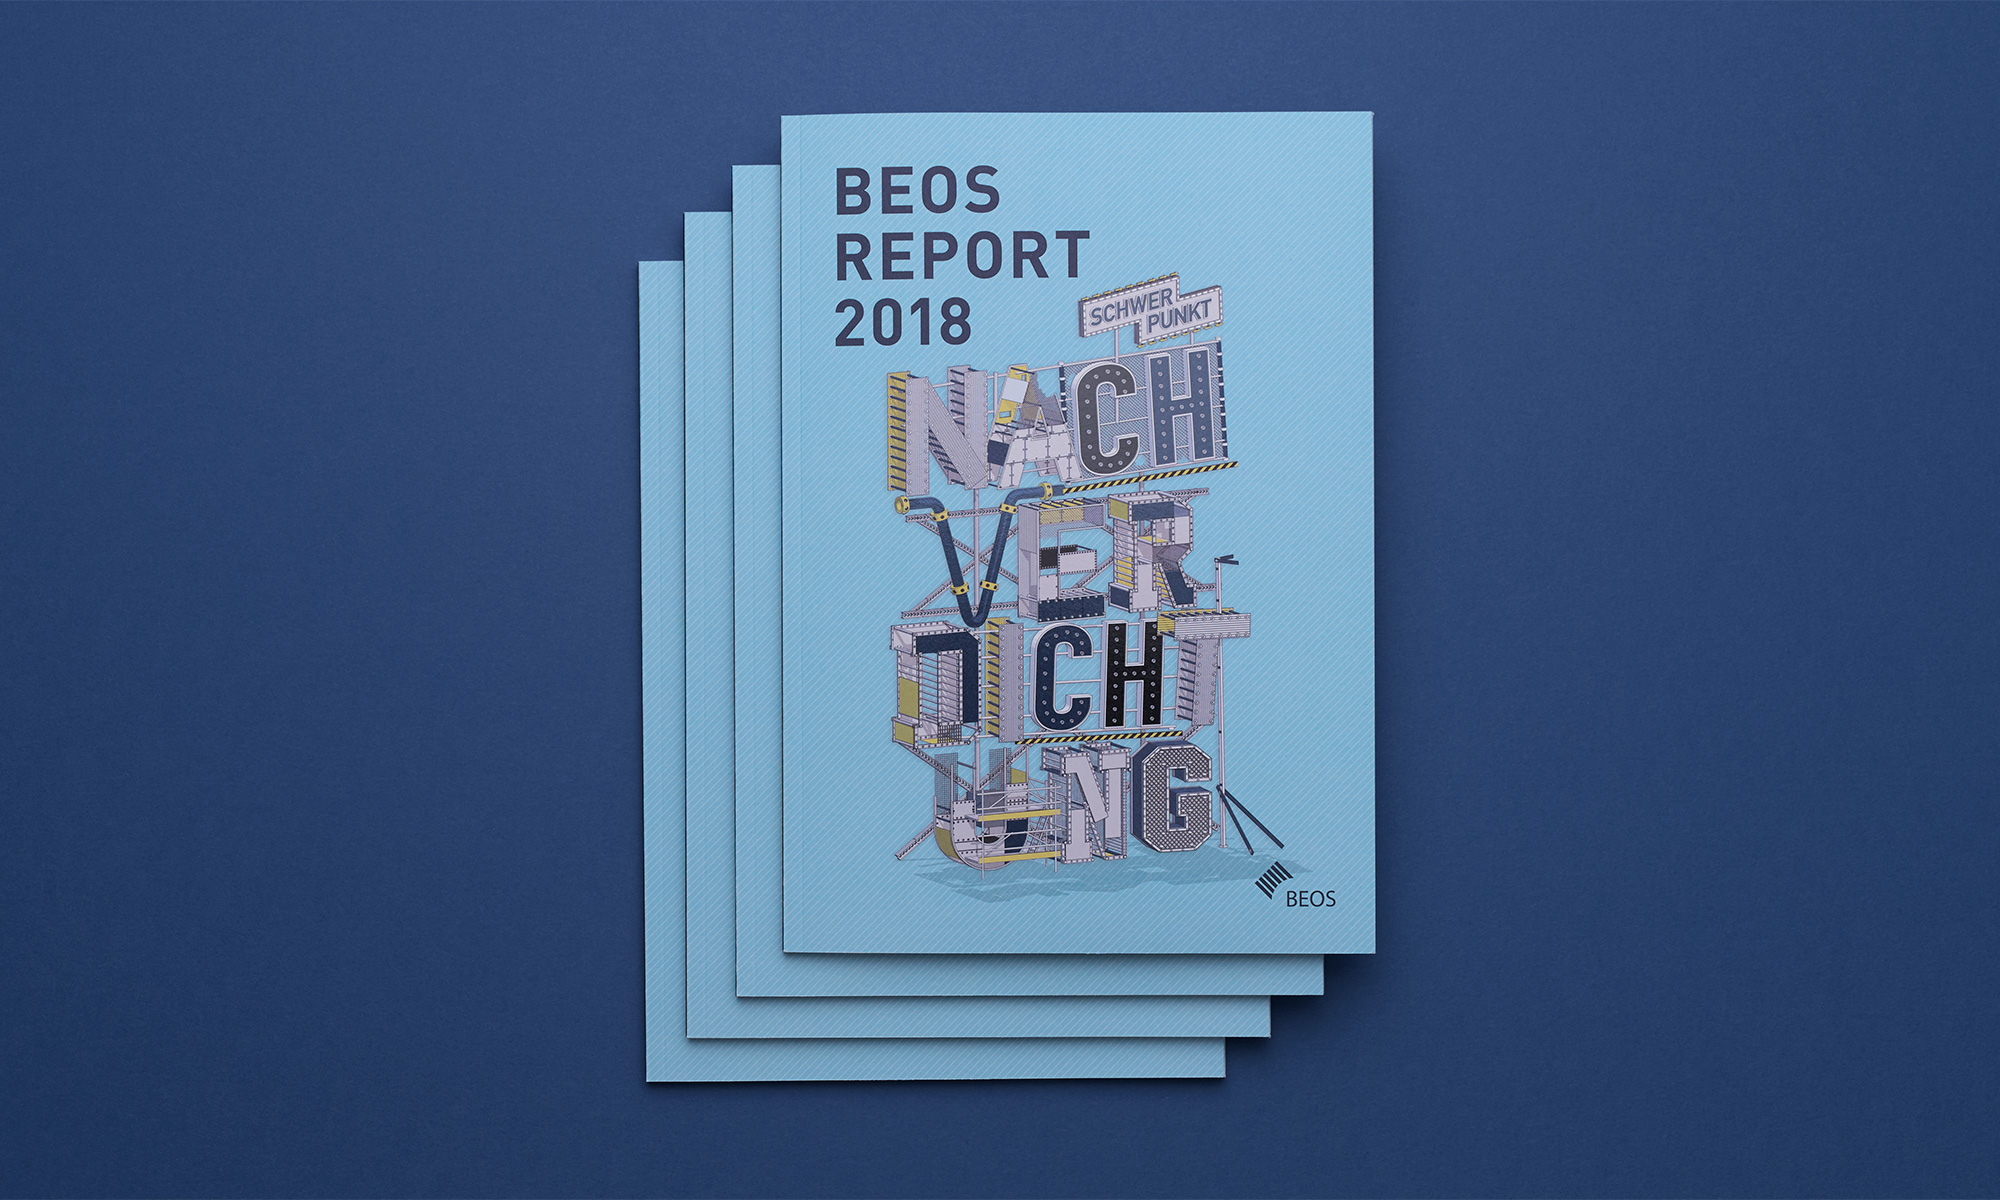 BEOS_REPORT_002